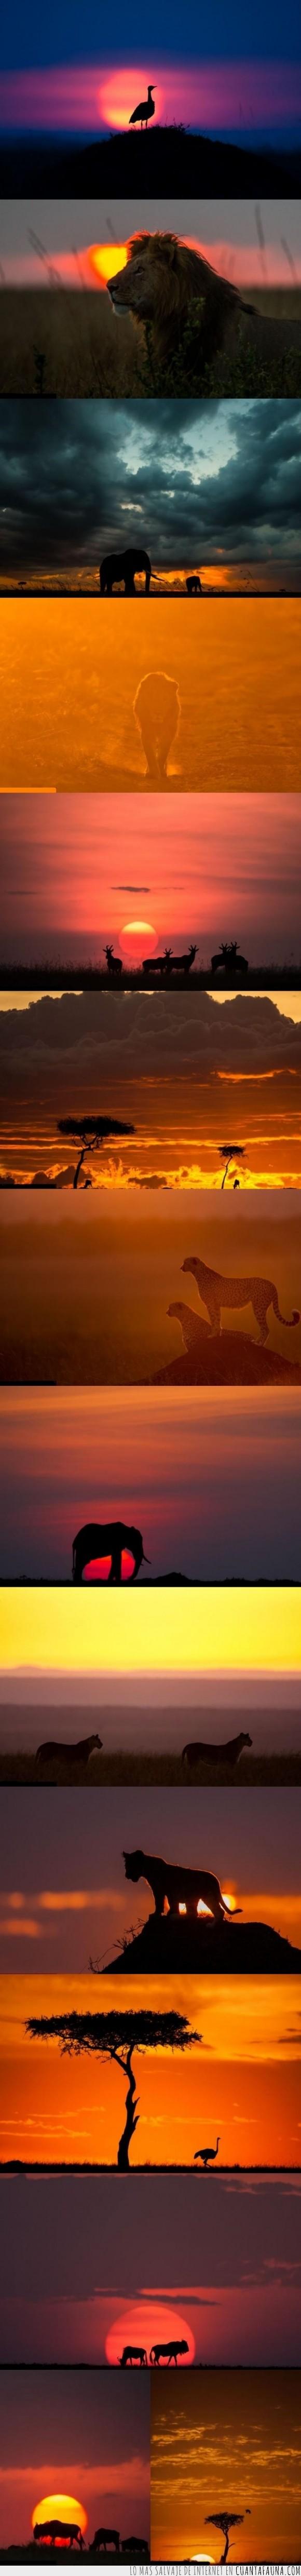 África,amaneceres,animales,atardeceres,avestruz,elefante,gacela,guepardo,impresionante,león,Masai Mara,ñu,Paul Goldstein